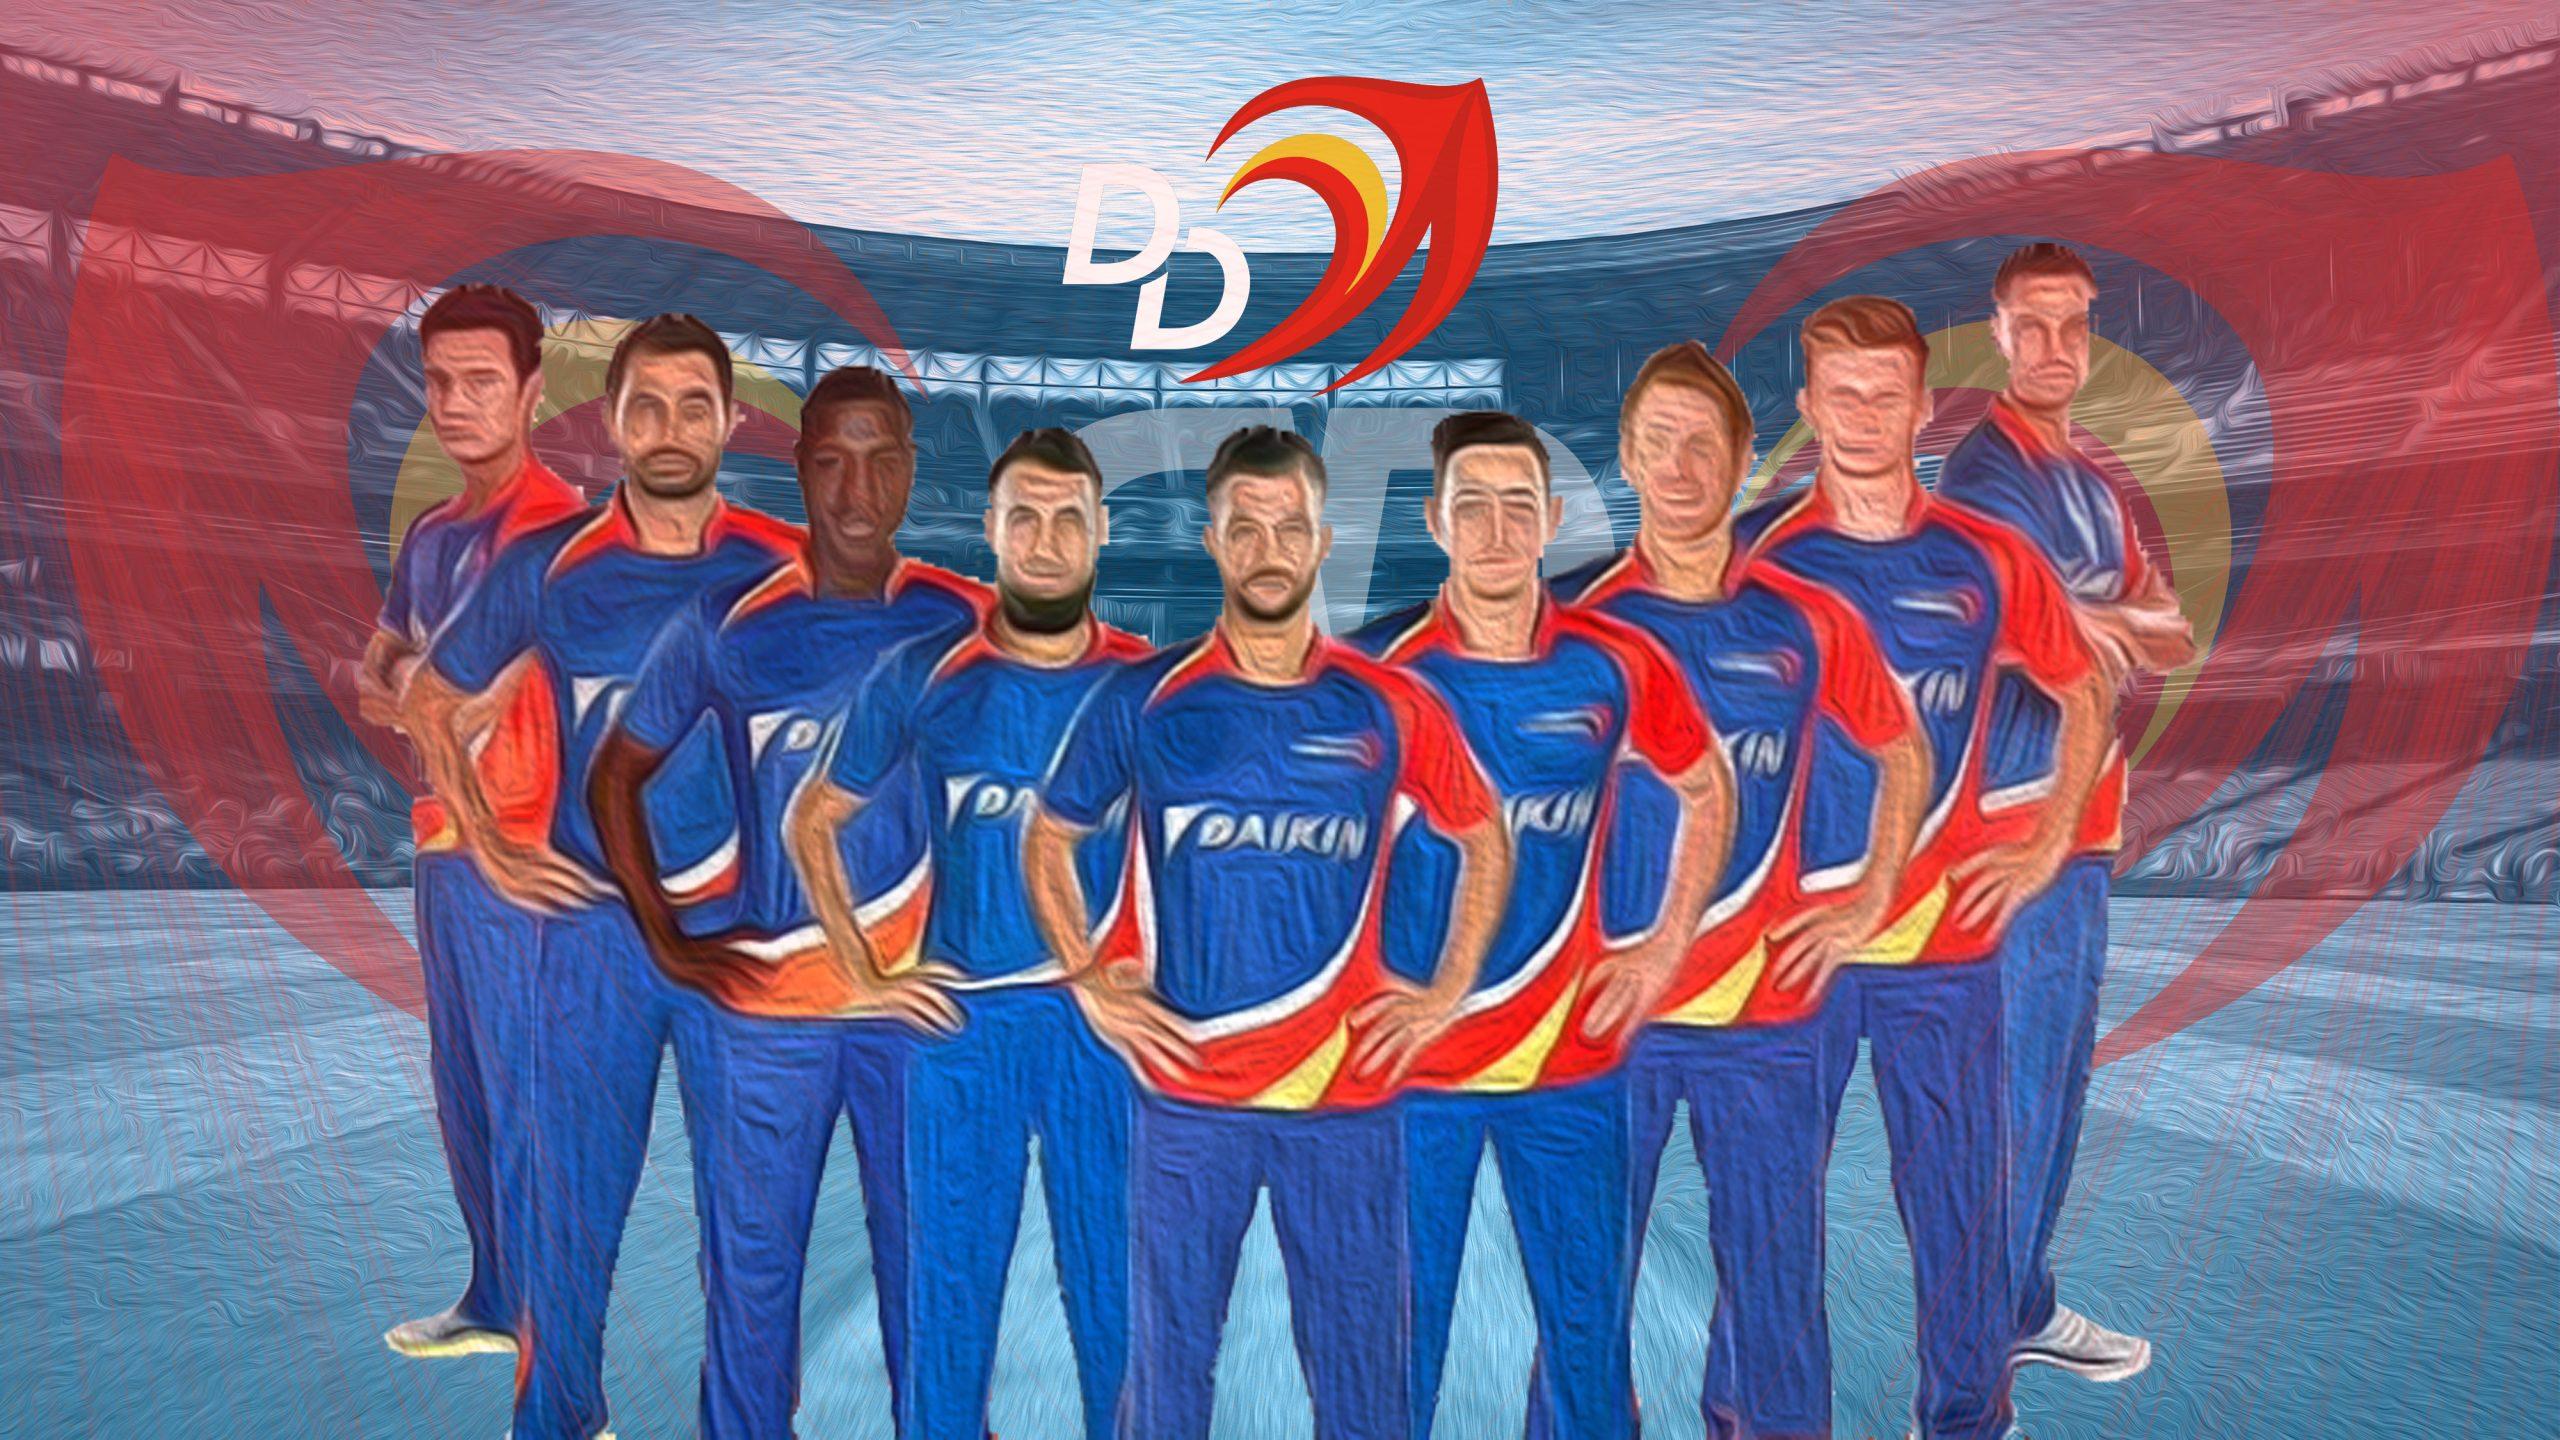 IPL team Delhi daredevils